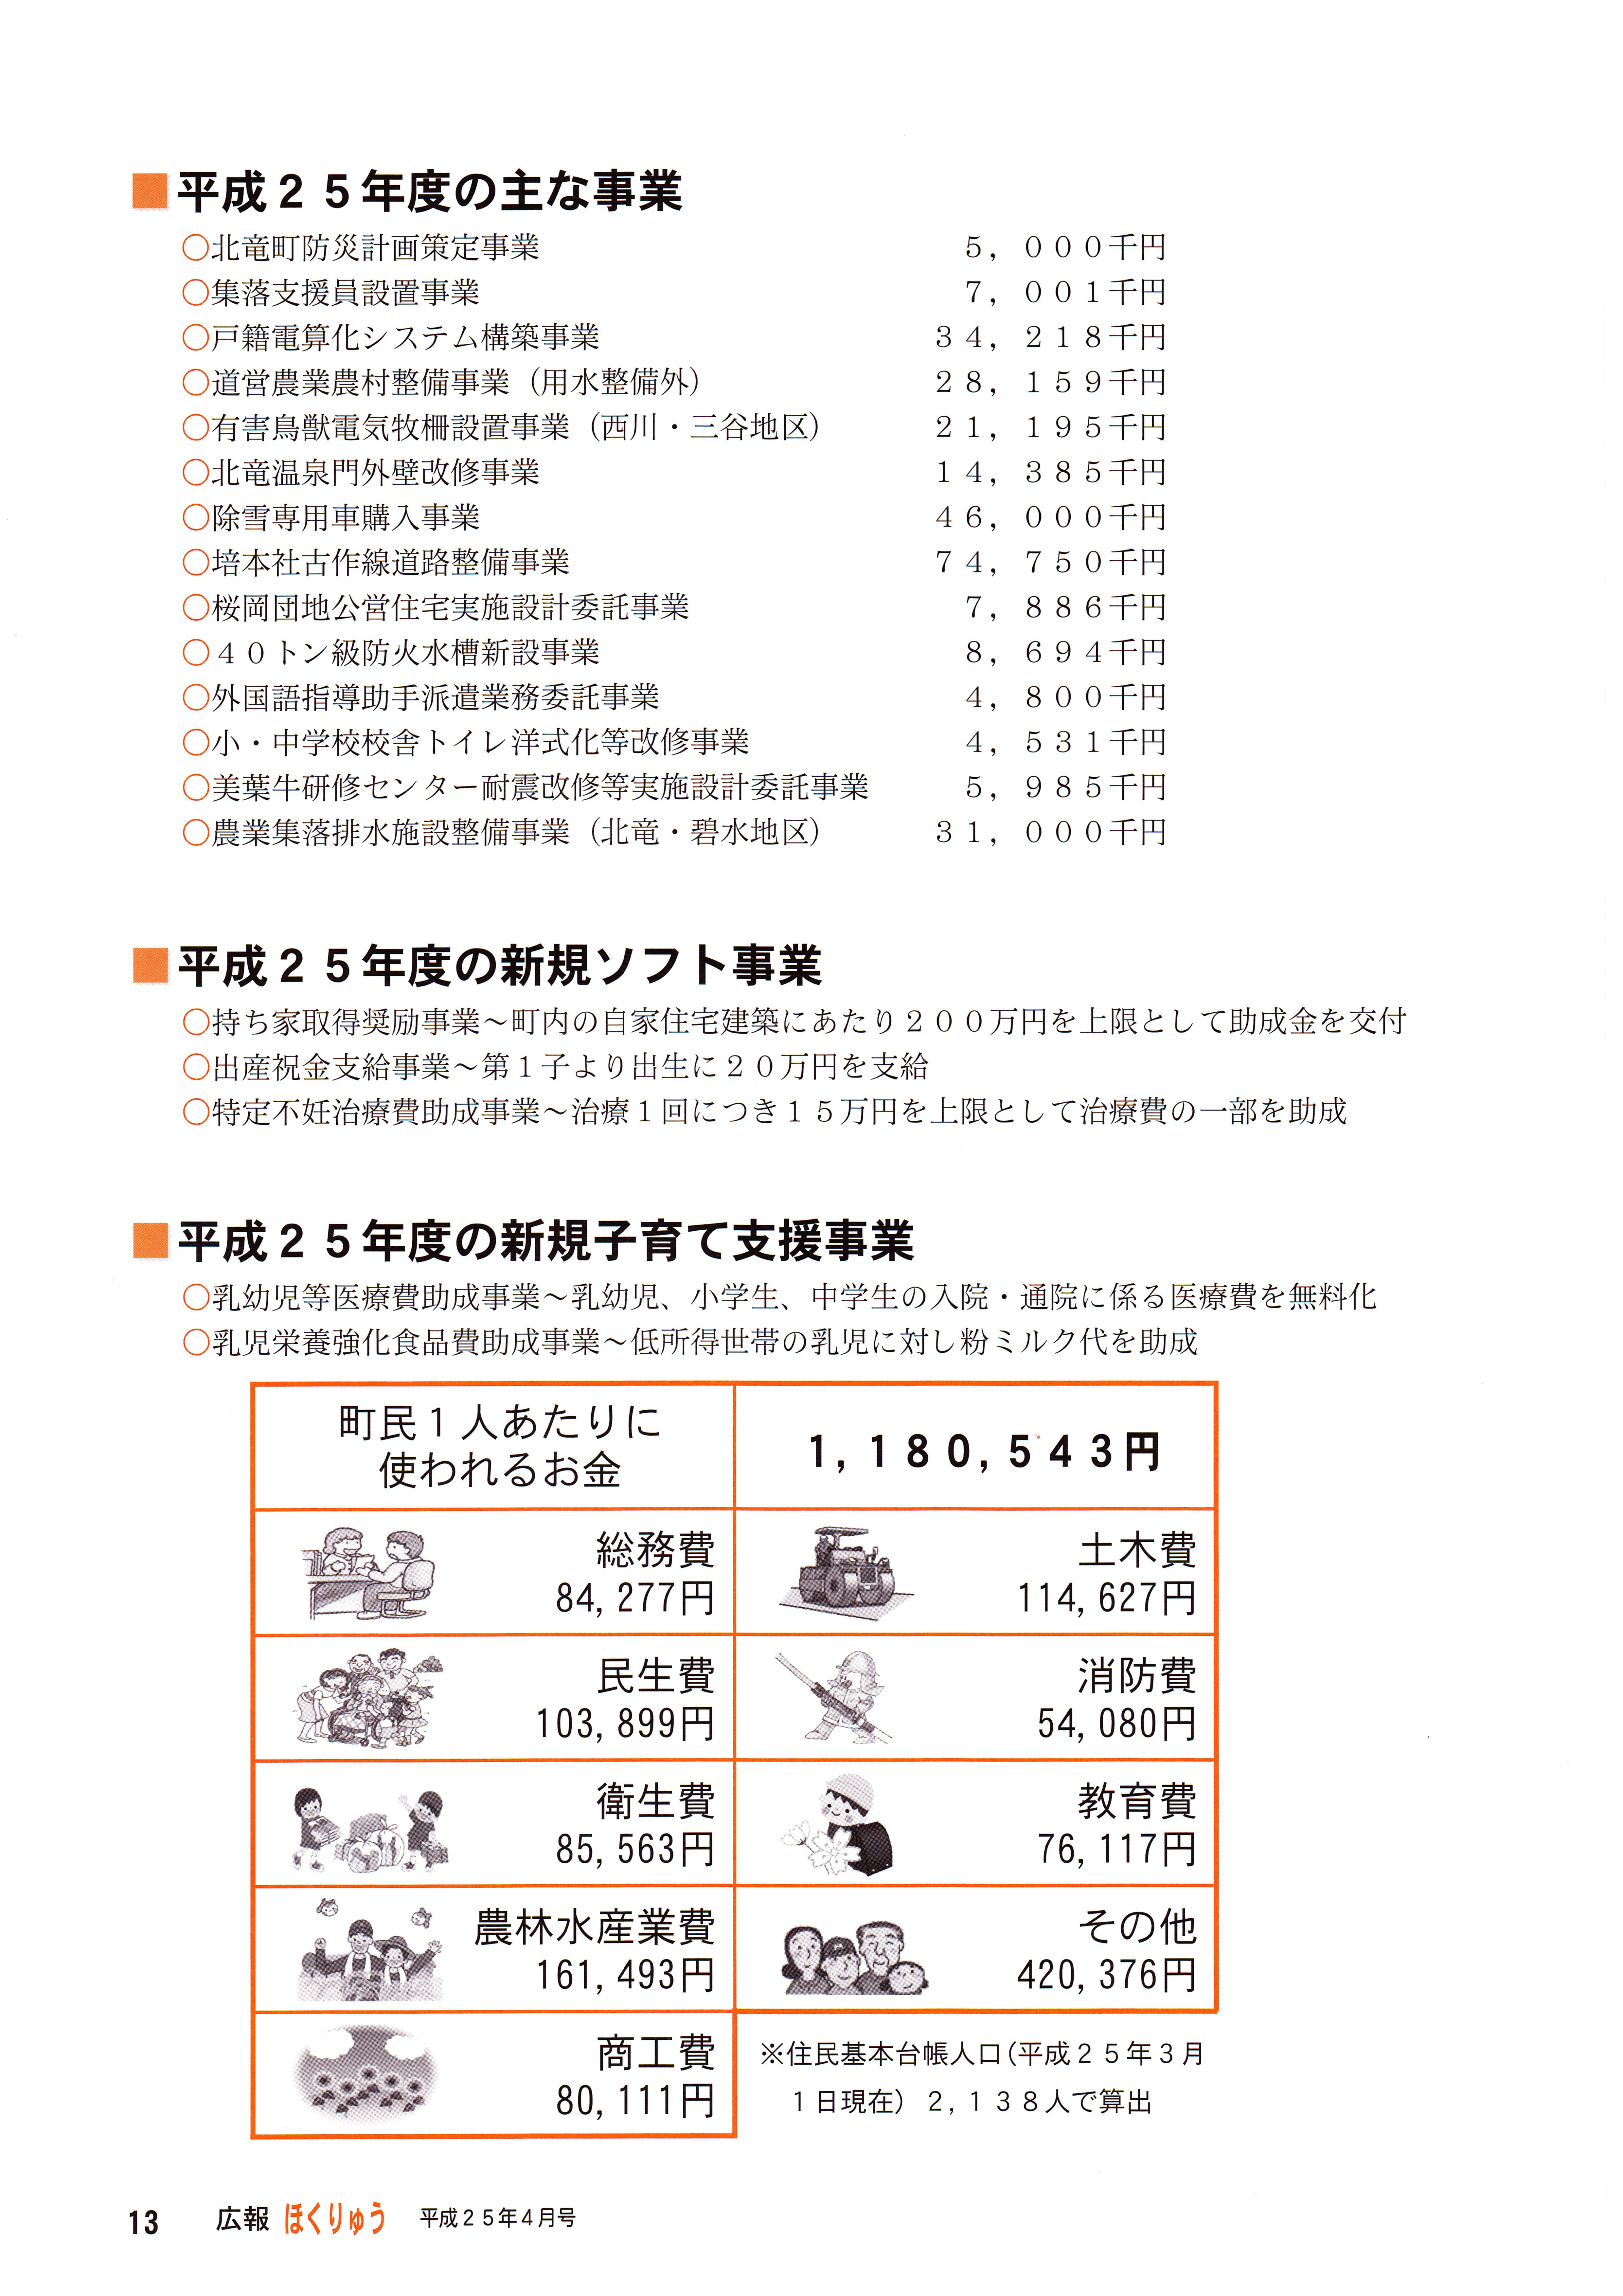 Photo: 平成25年度行政執行方針